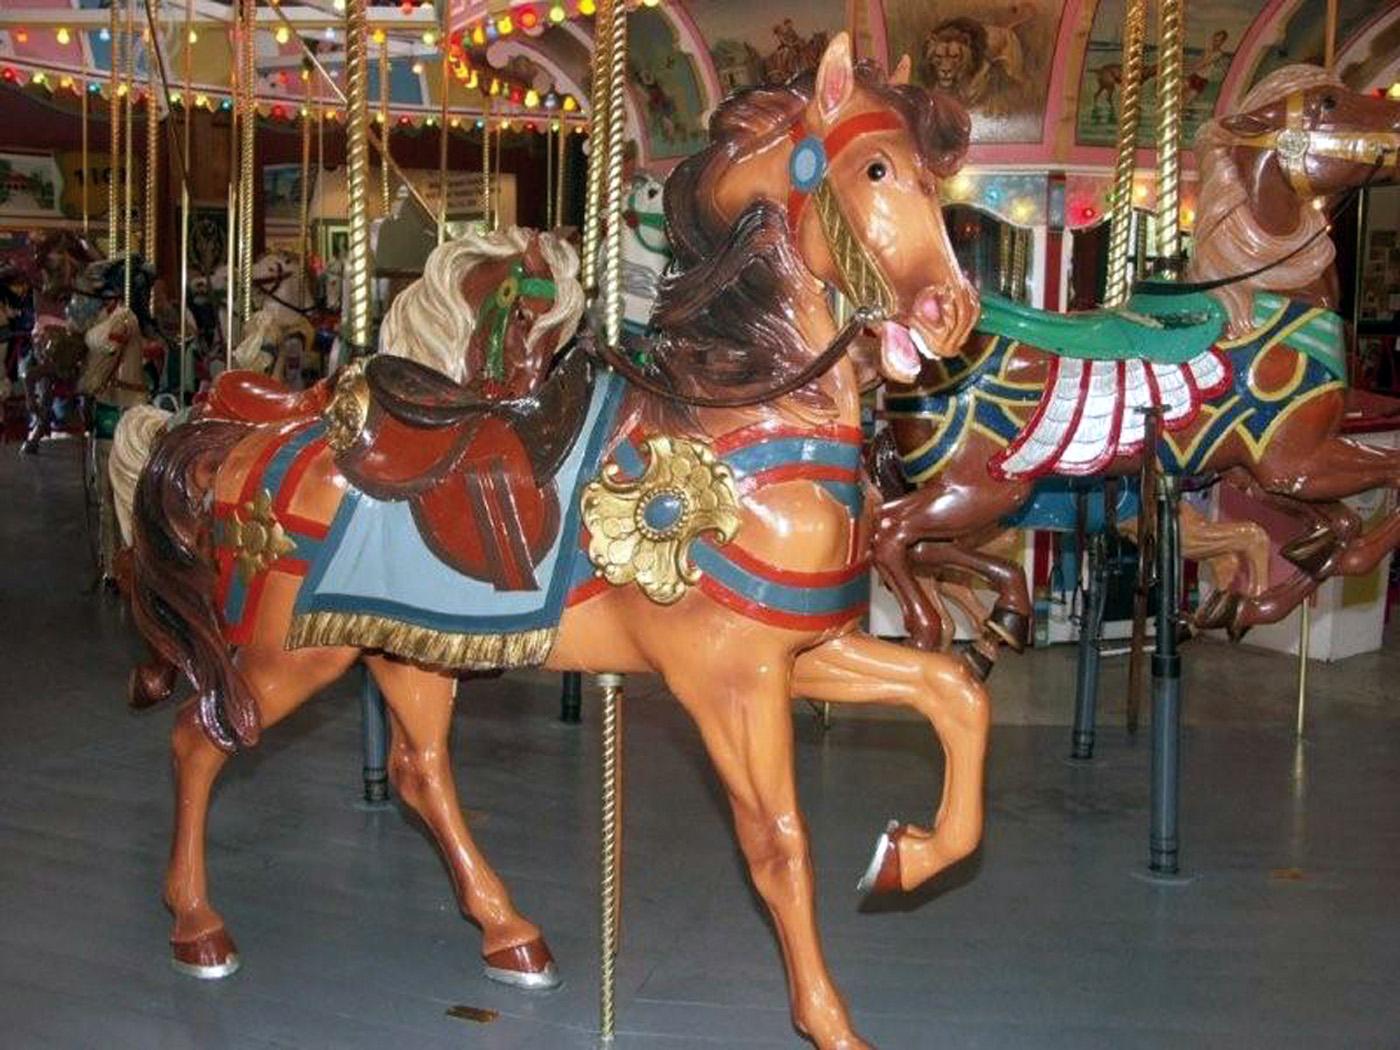 1927-PTC-80-carousel-horse-Holyoke-mgr-j-horwitz-photo